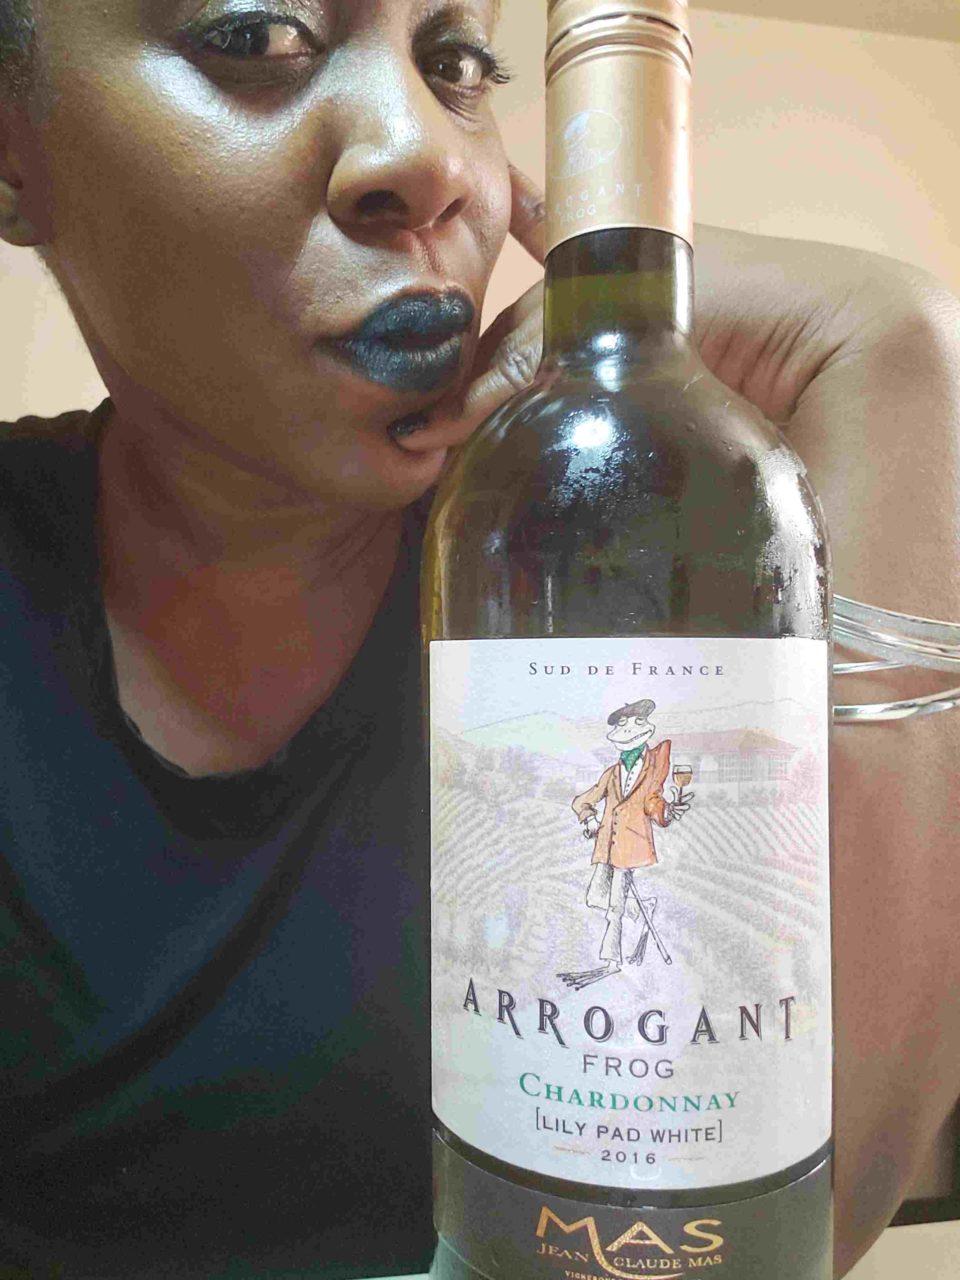 Witch On Wine Class: Arrogant Frog Chardonnay